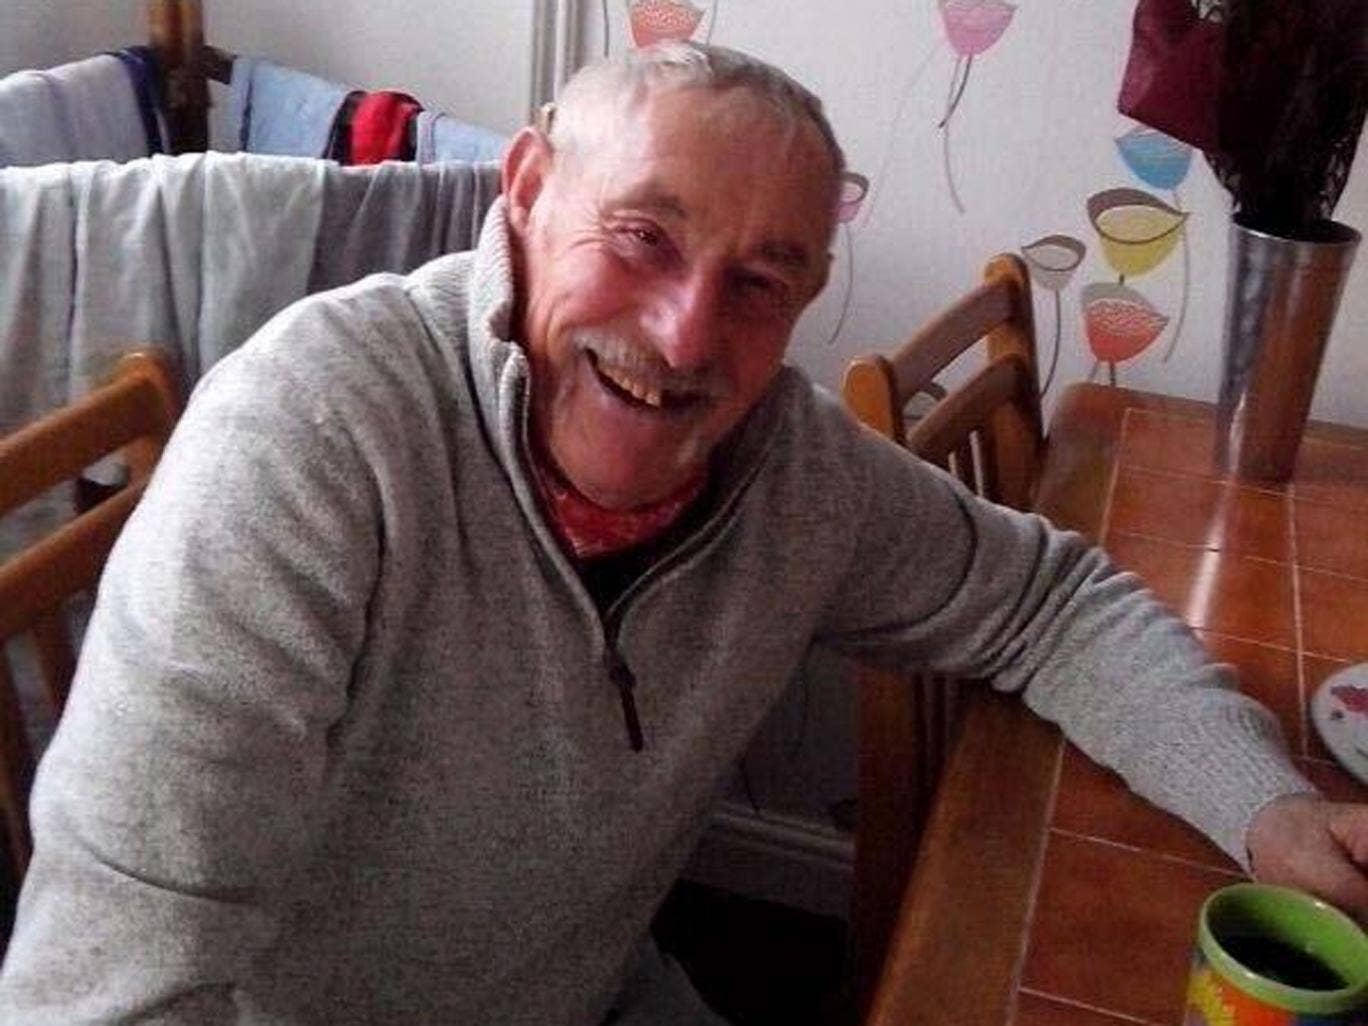 Arthur Jones, 73, who went missing in Crete on 19 June